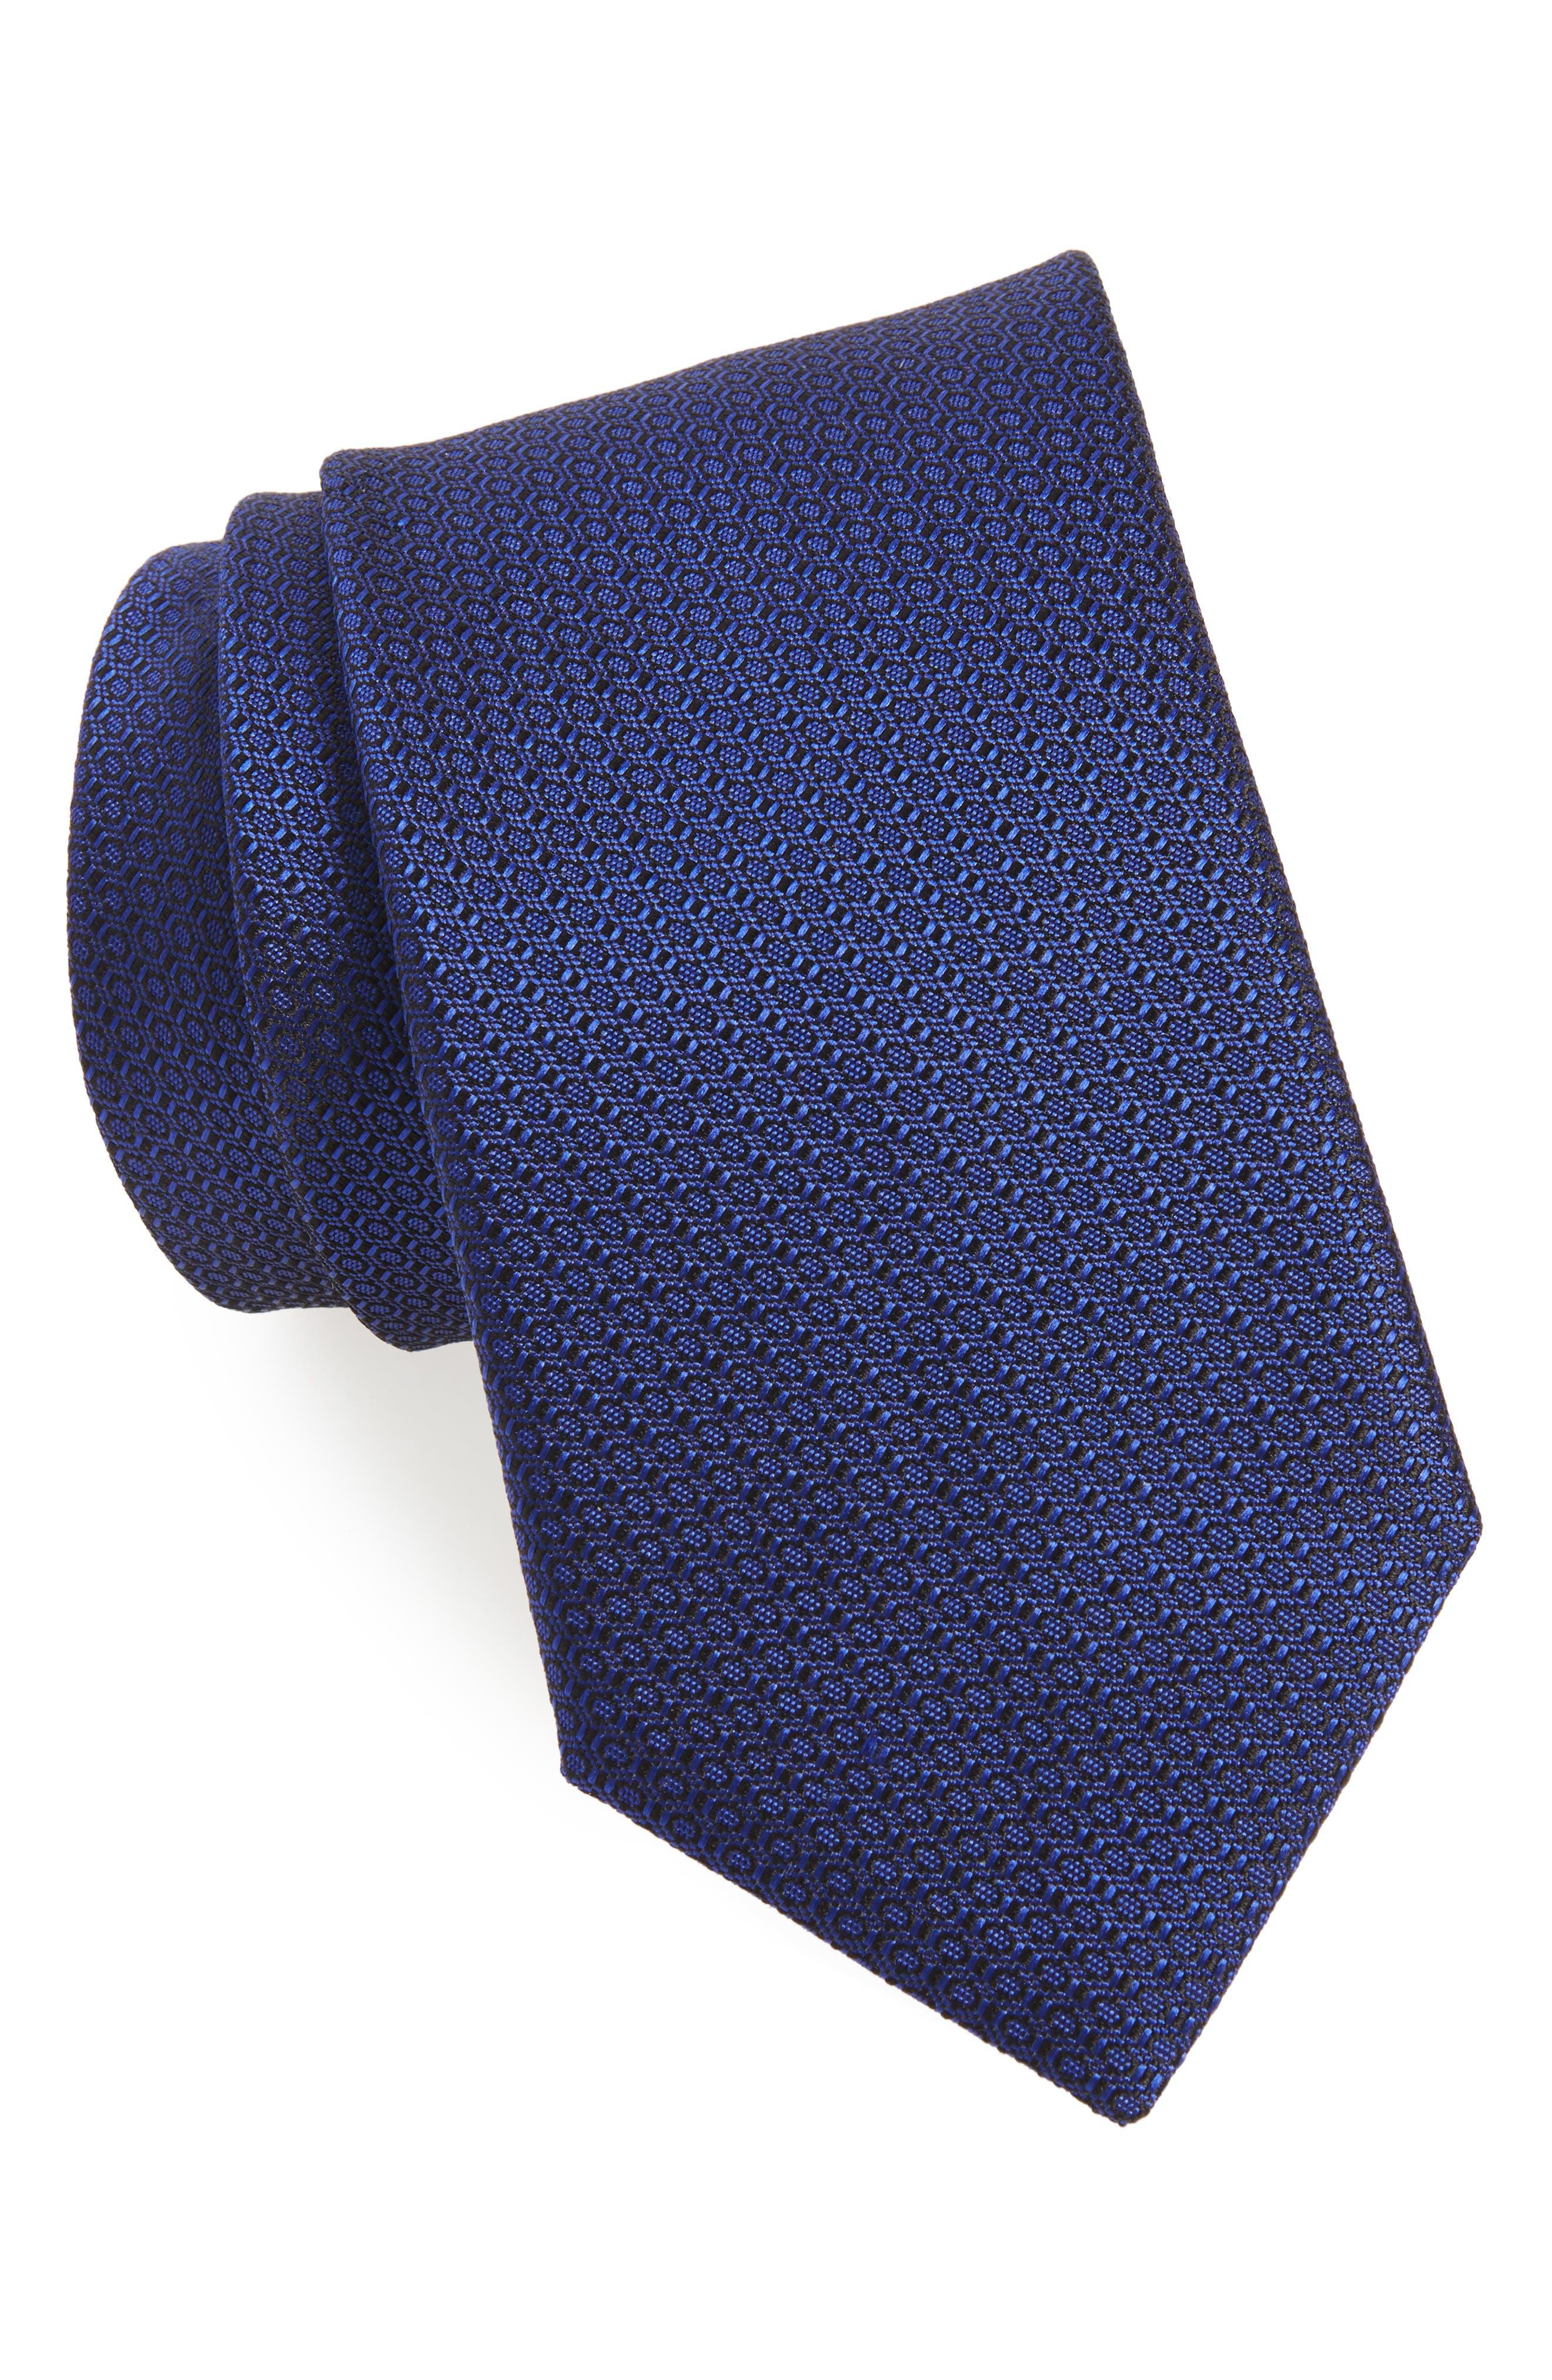 Solid Silk Tie,                             Main thumbnail 1, color,                             NAVY